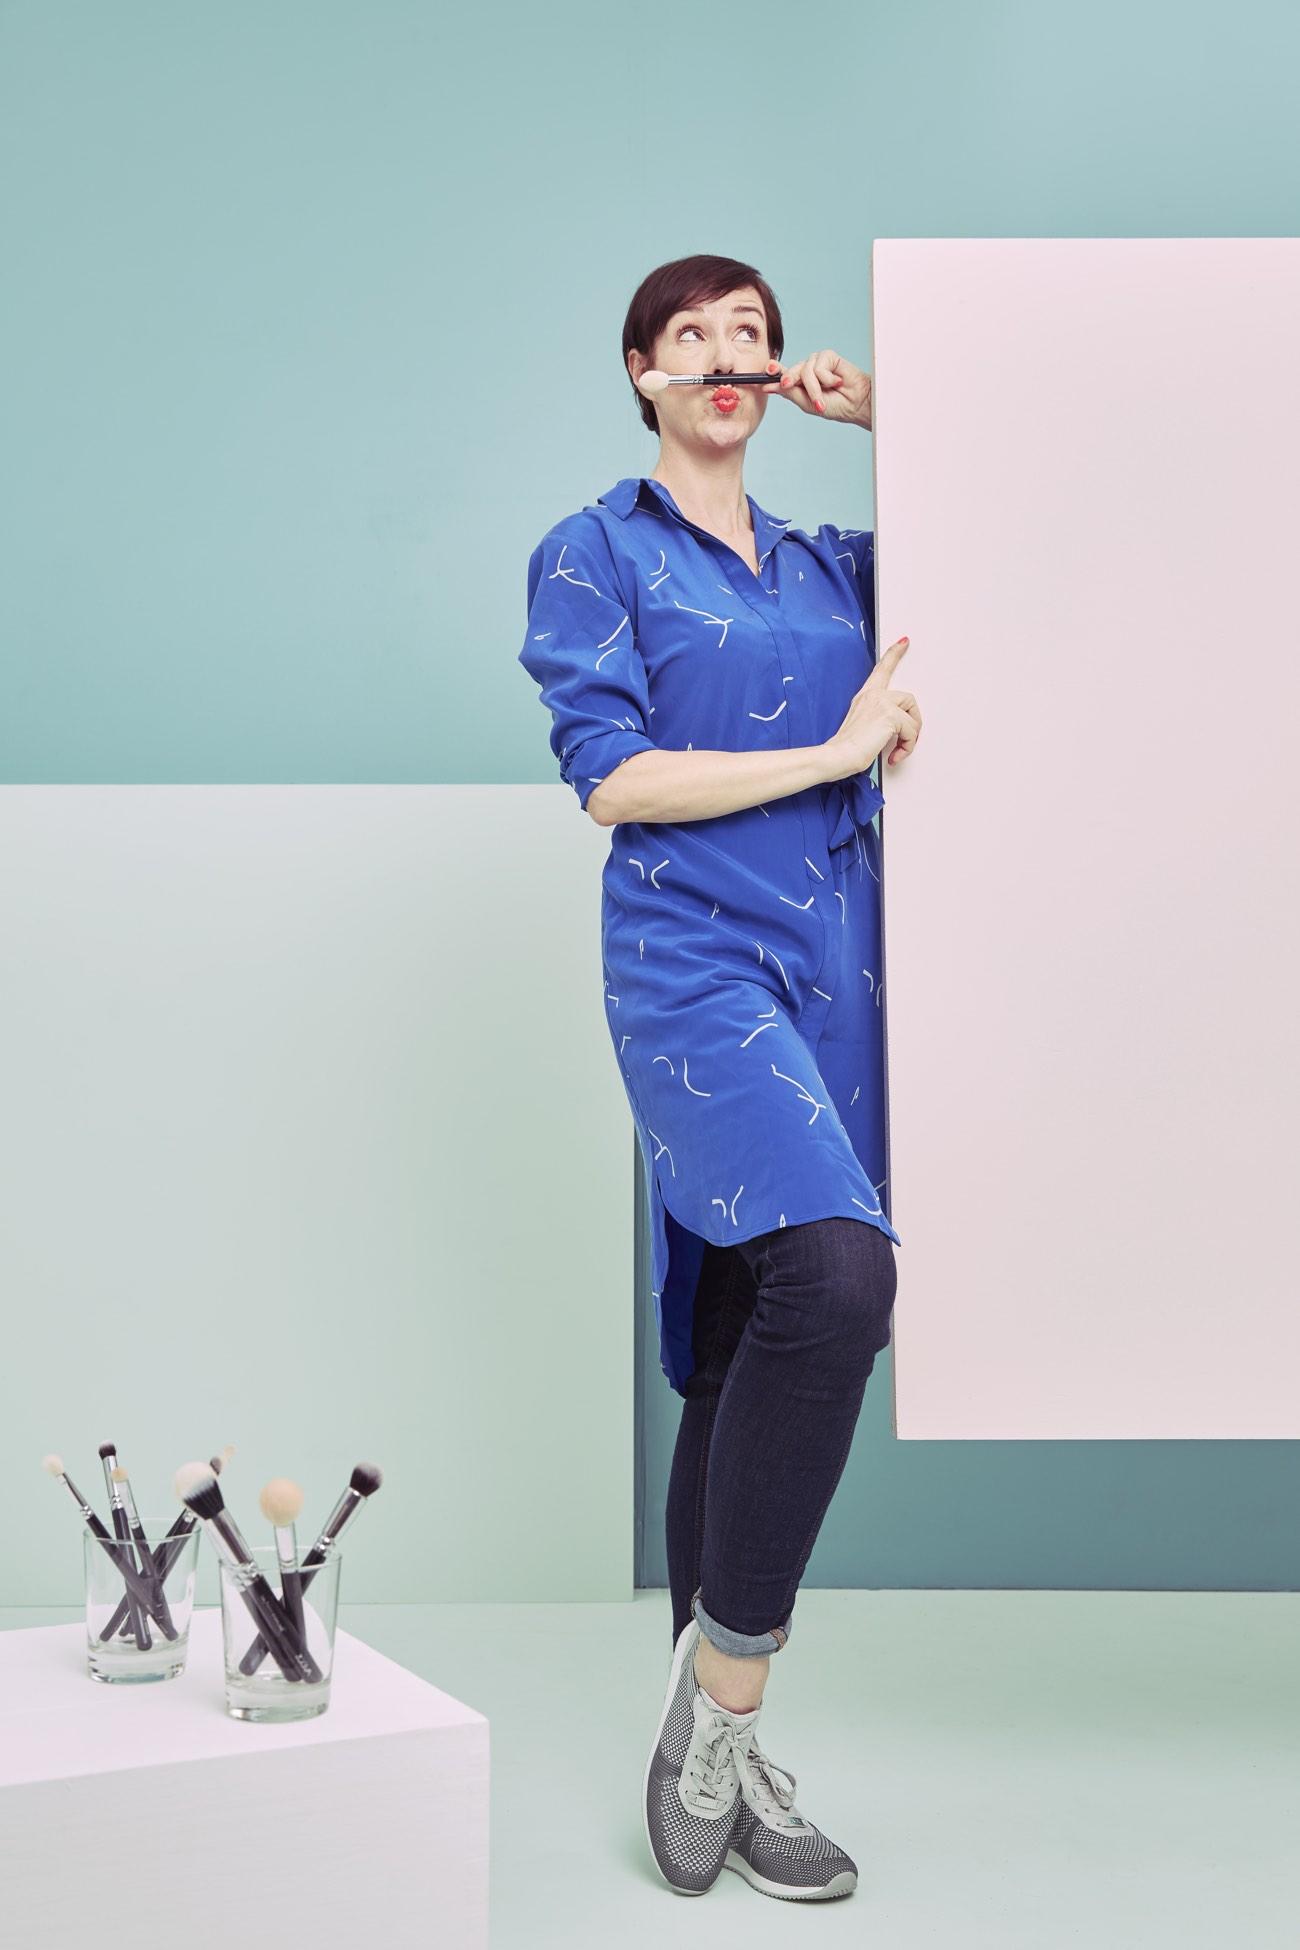 Make up Artist Anja Frankenhäuser aka Schminktante testet den neuen Fusion4 Sneaker.